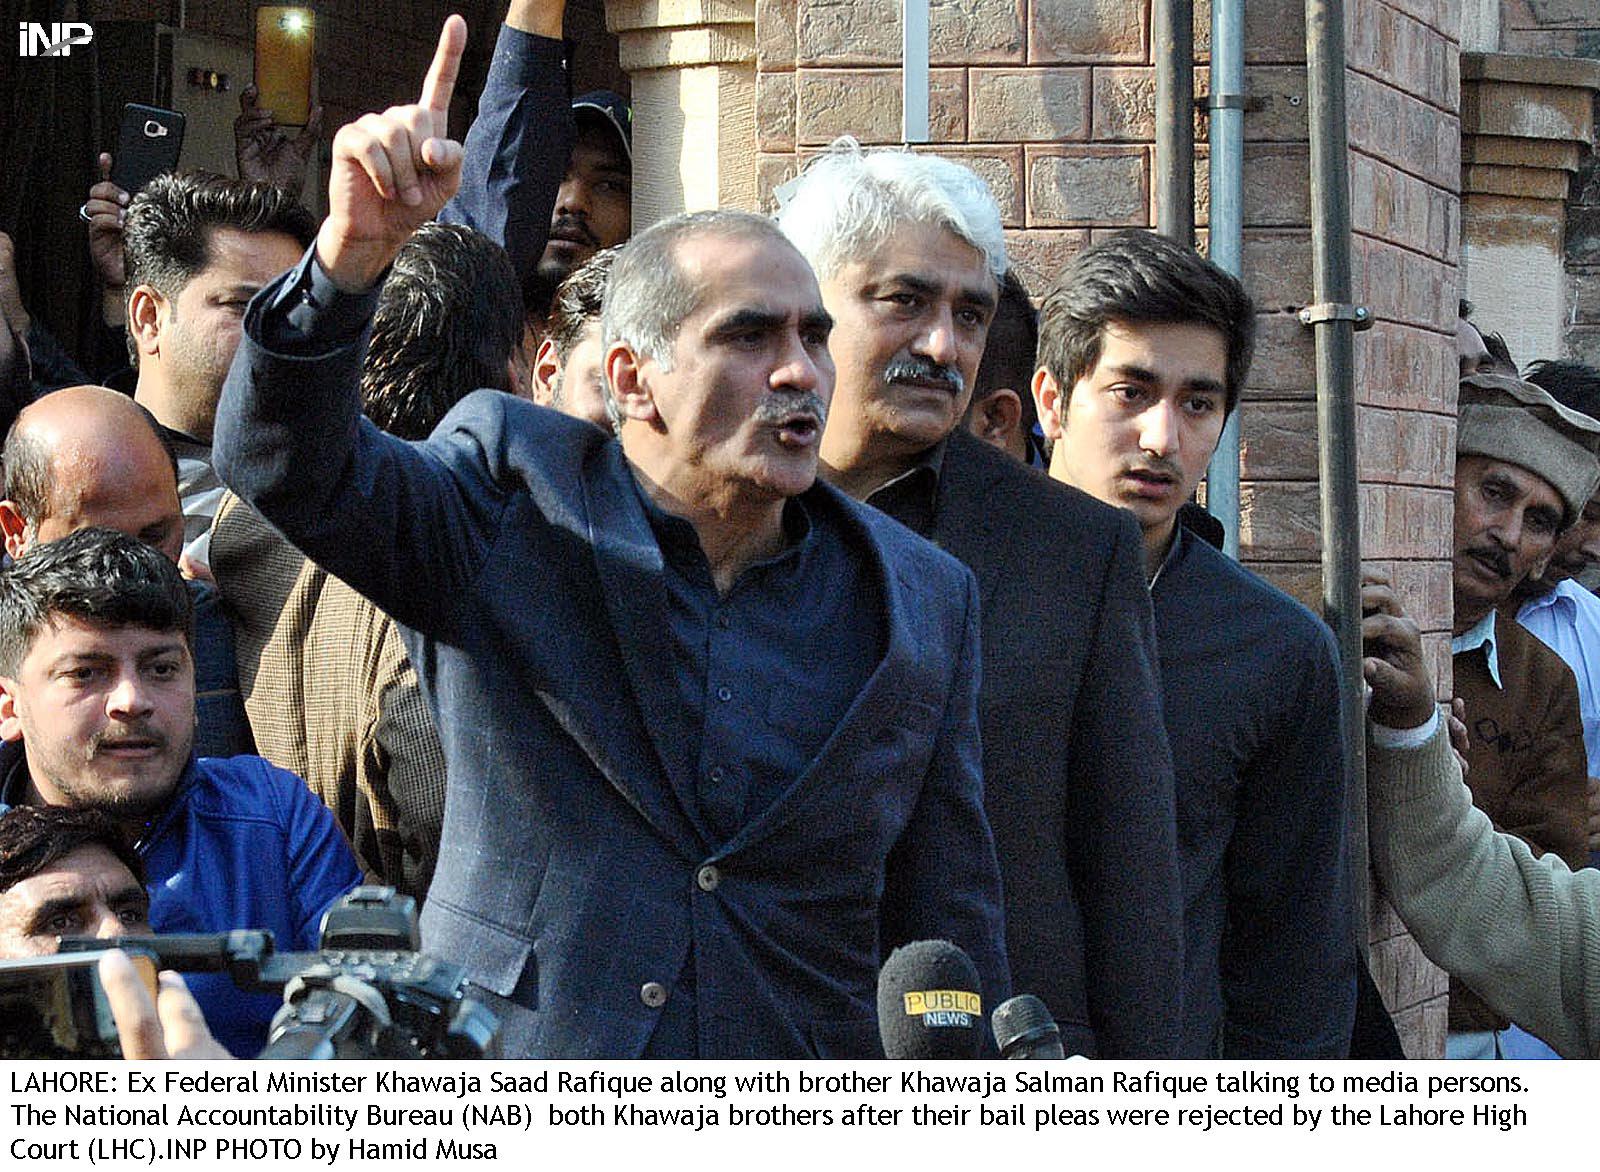 khawaja saad rafique photo inp